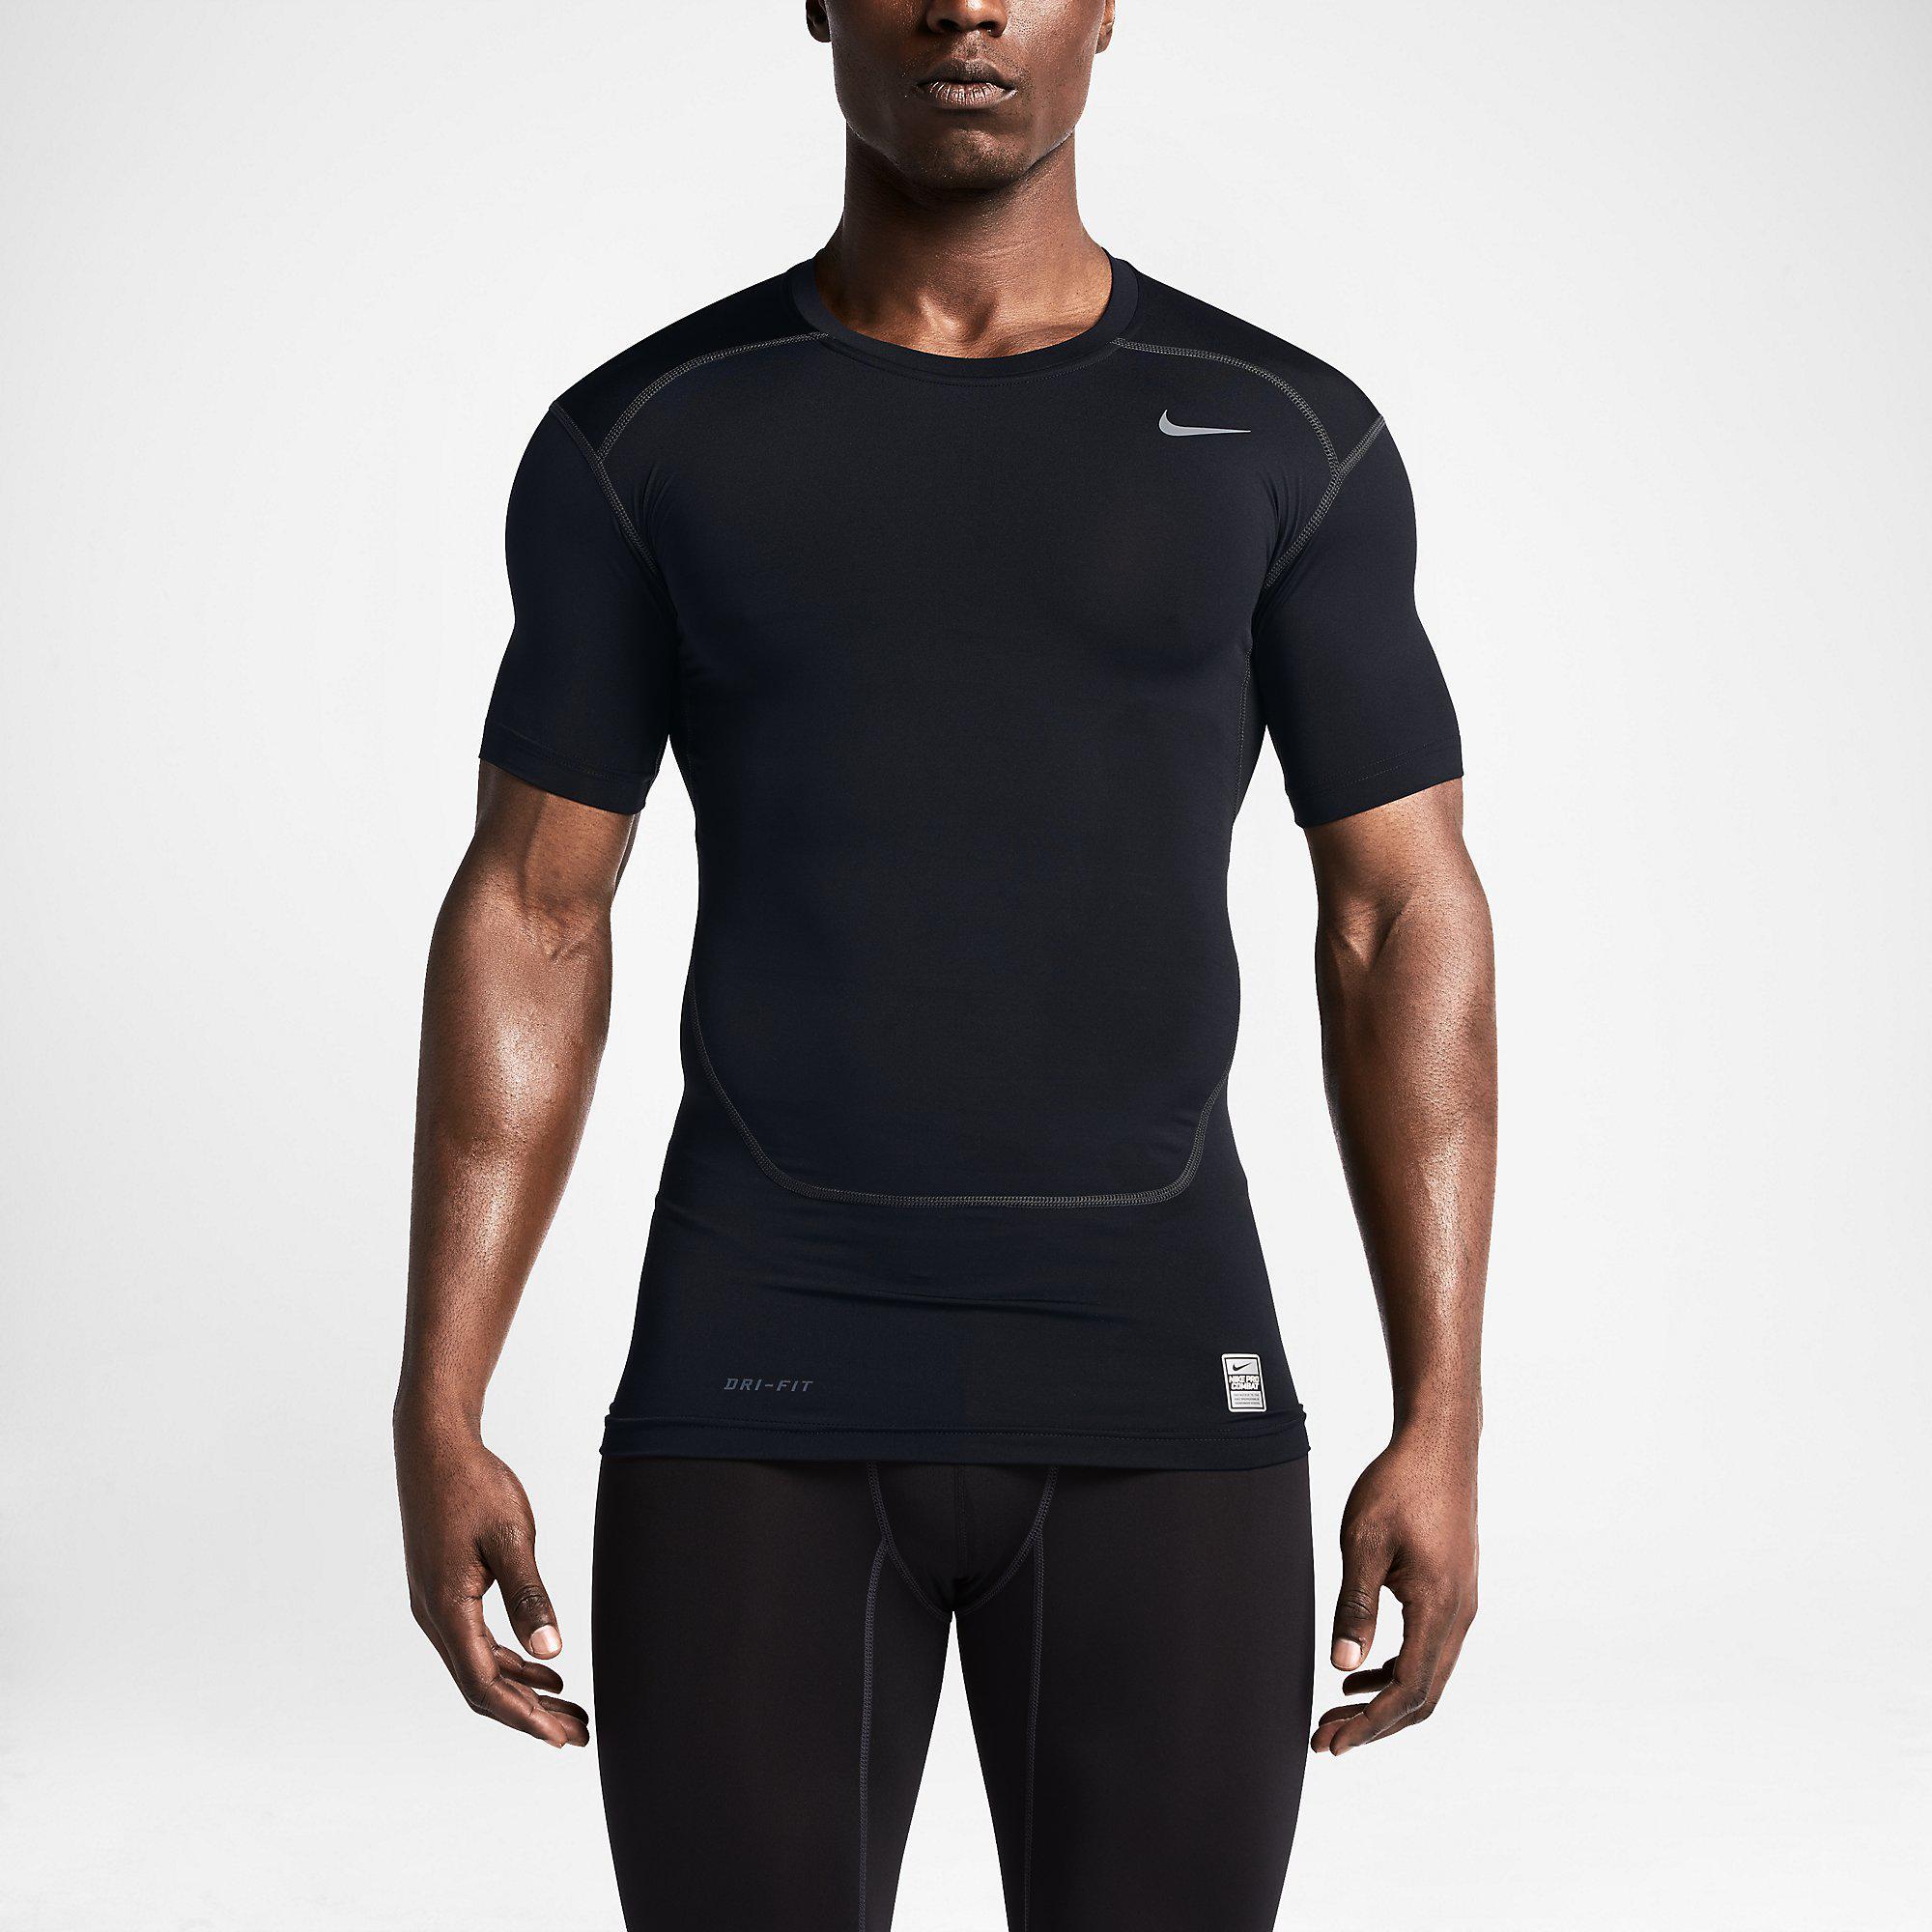 Nike Pro 2 0 Combat Core Short Sleeve Shirt Black Cool